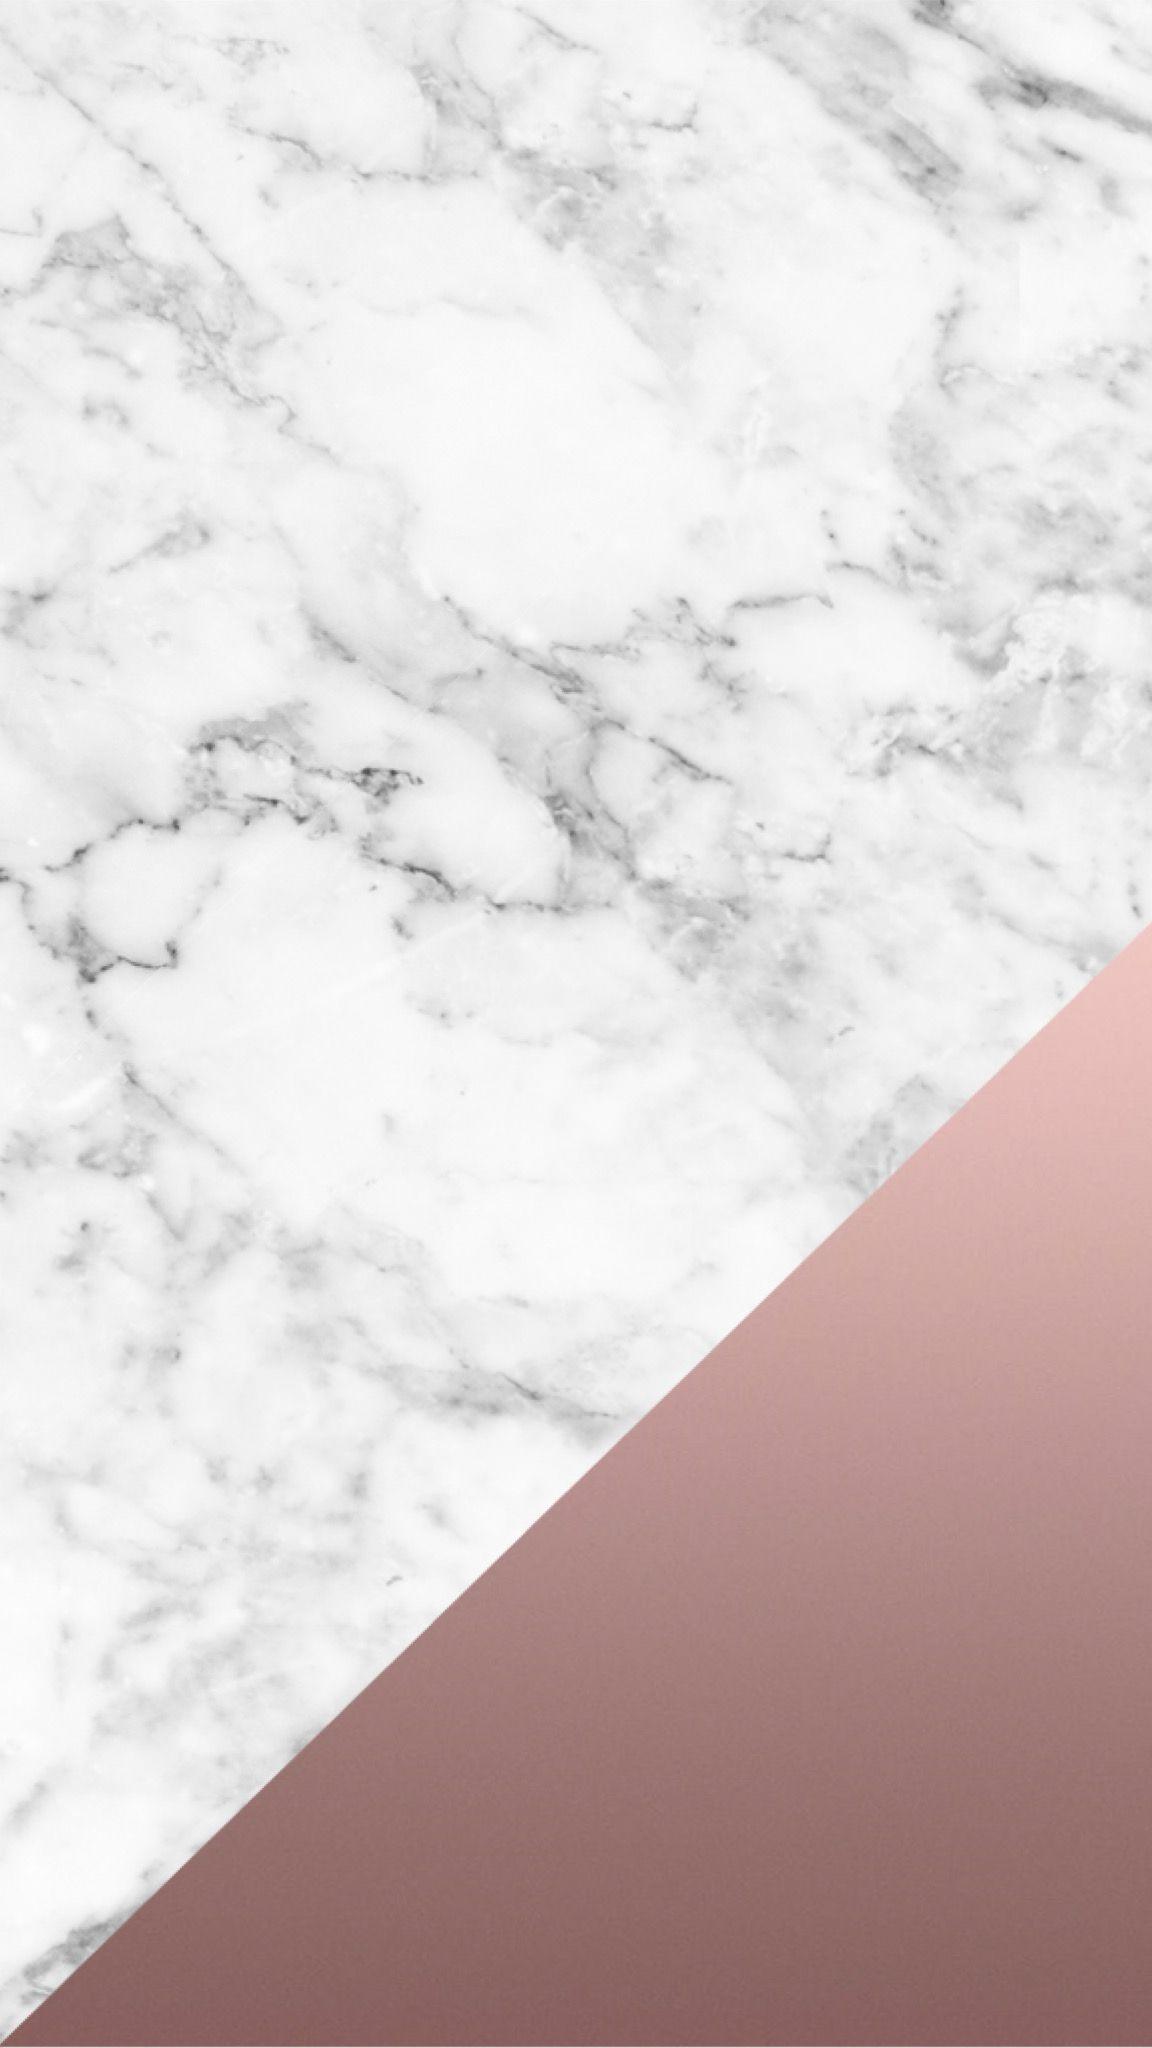 Rose Gold Marble Iphone Tumblr Wallpaper